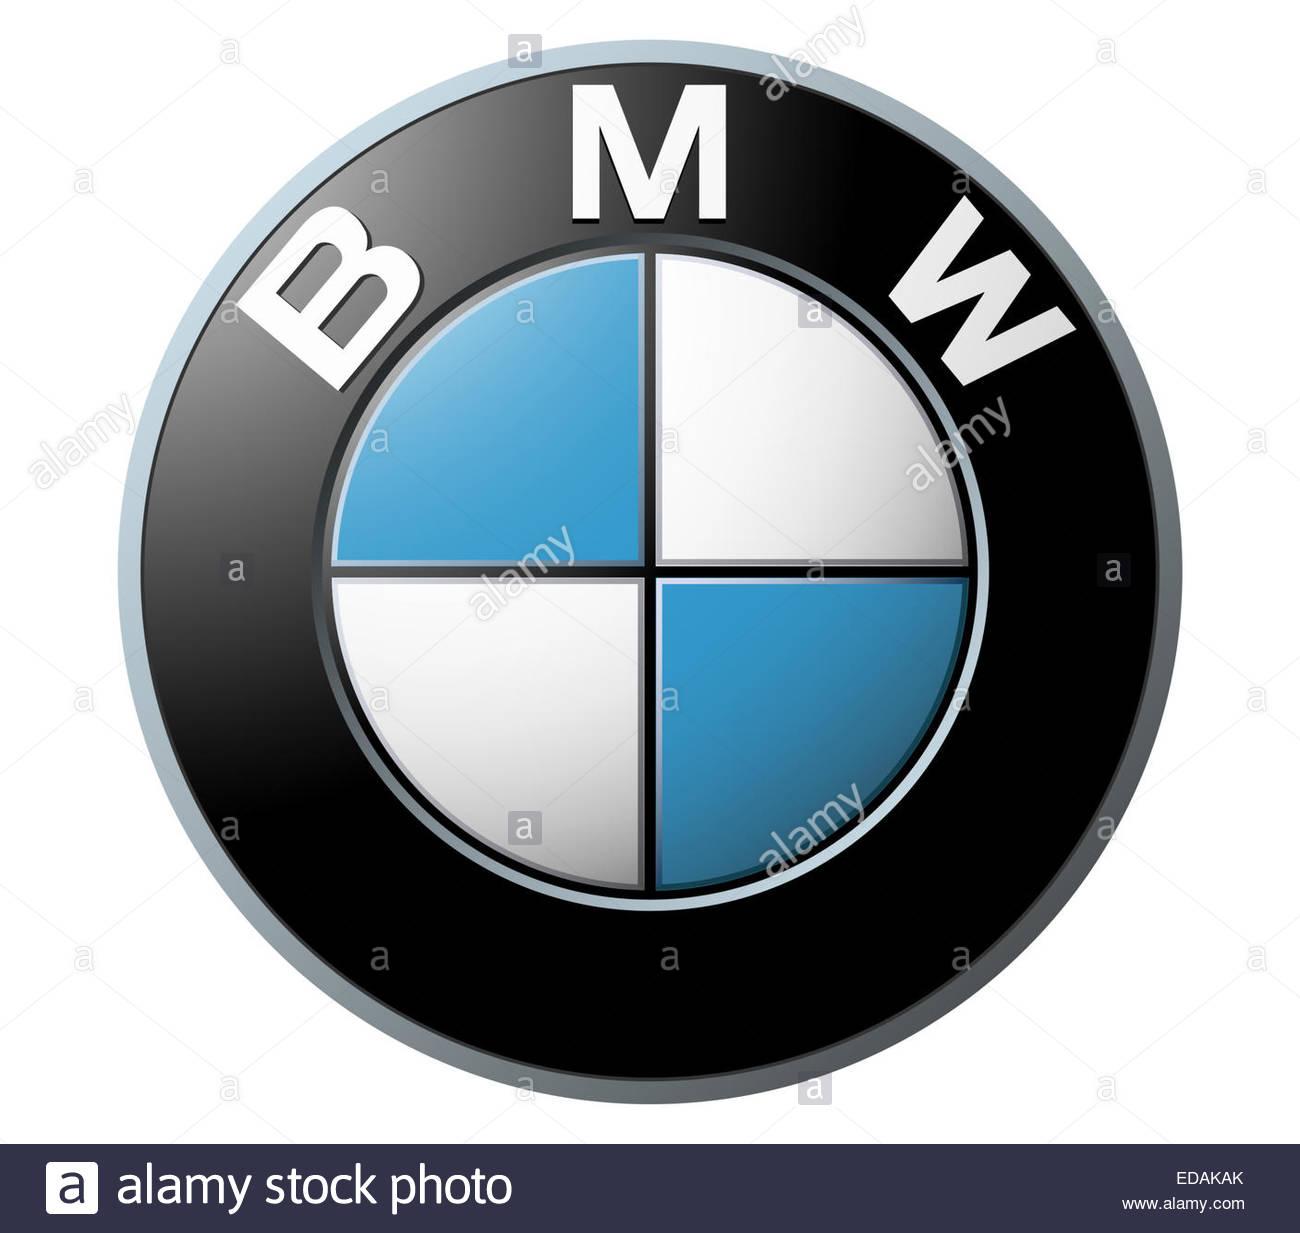 BMW logo icon sign - Stock Image